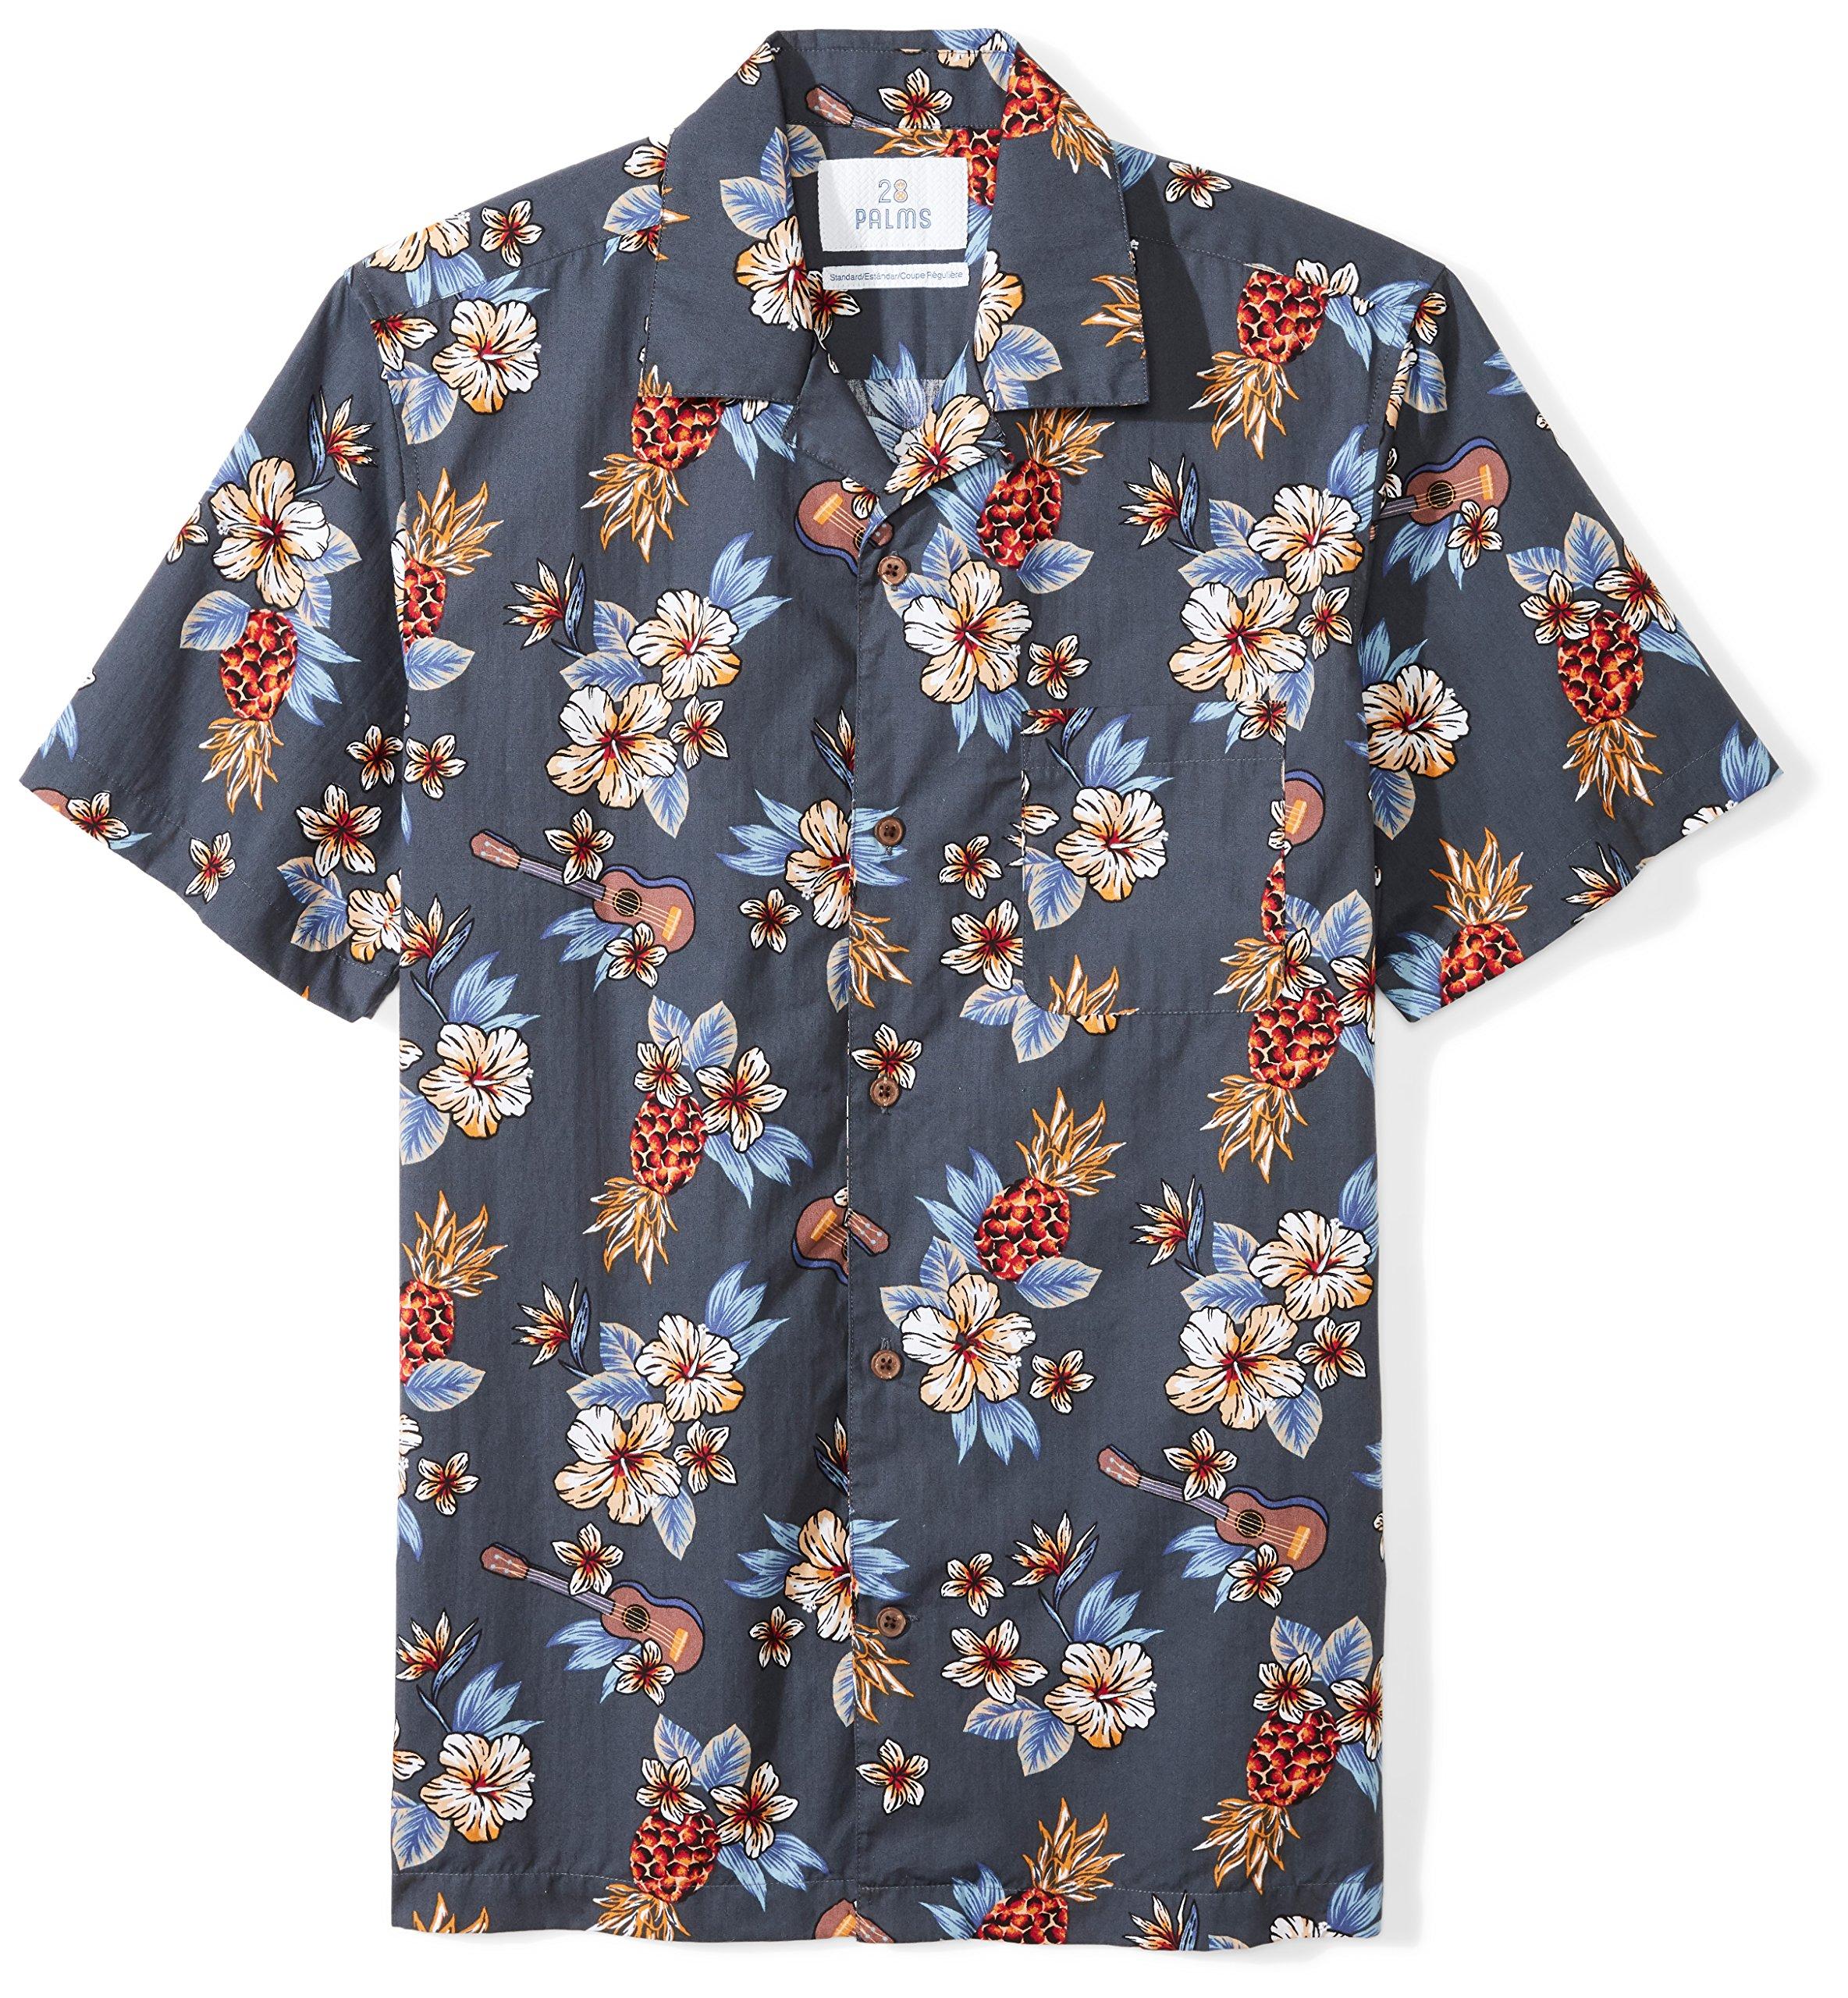 28 Palms Men's Standard-Fit 100% Cotton Tropical Hawaiian Shirt, Blue Guitar Floral, X-Large by 28 Palms